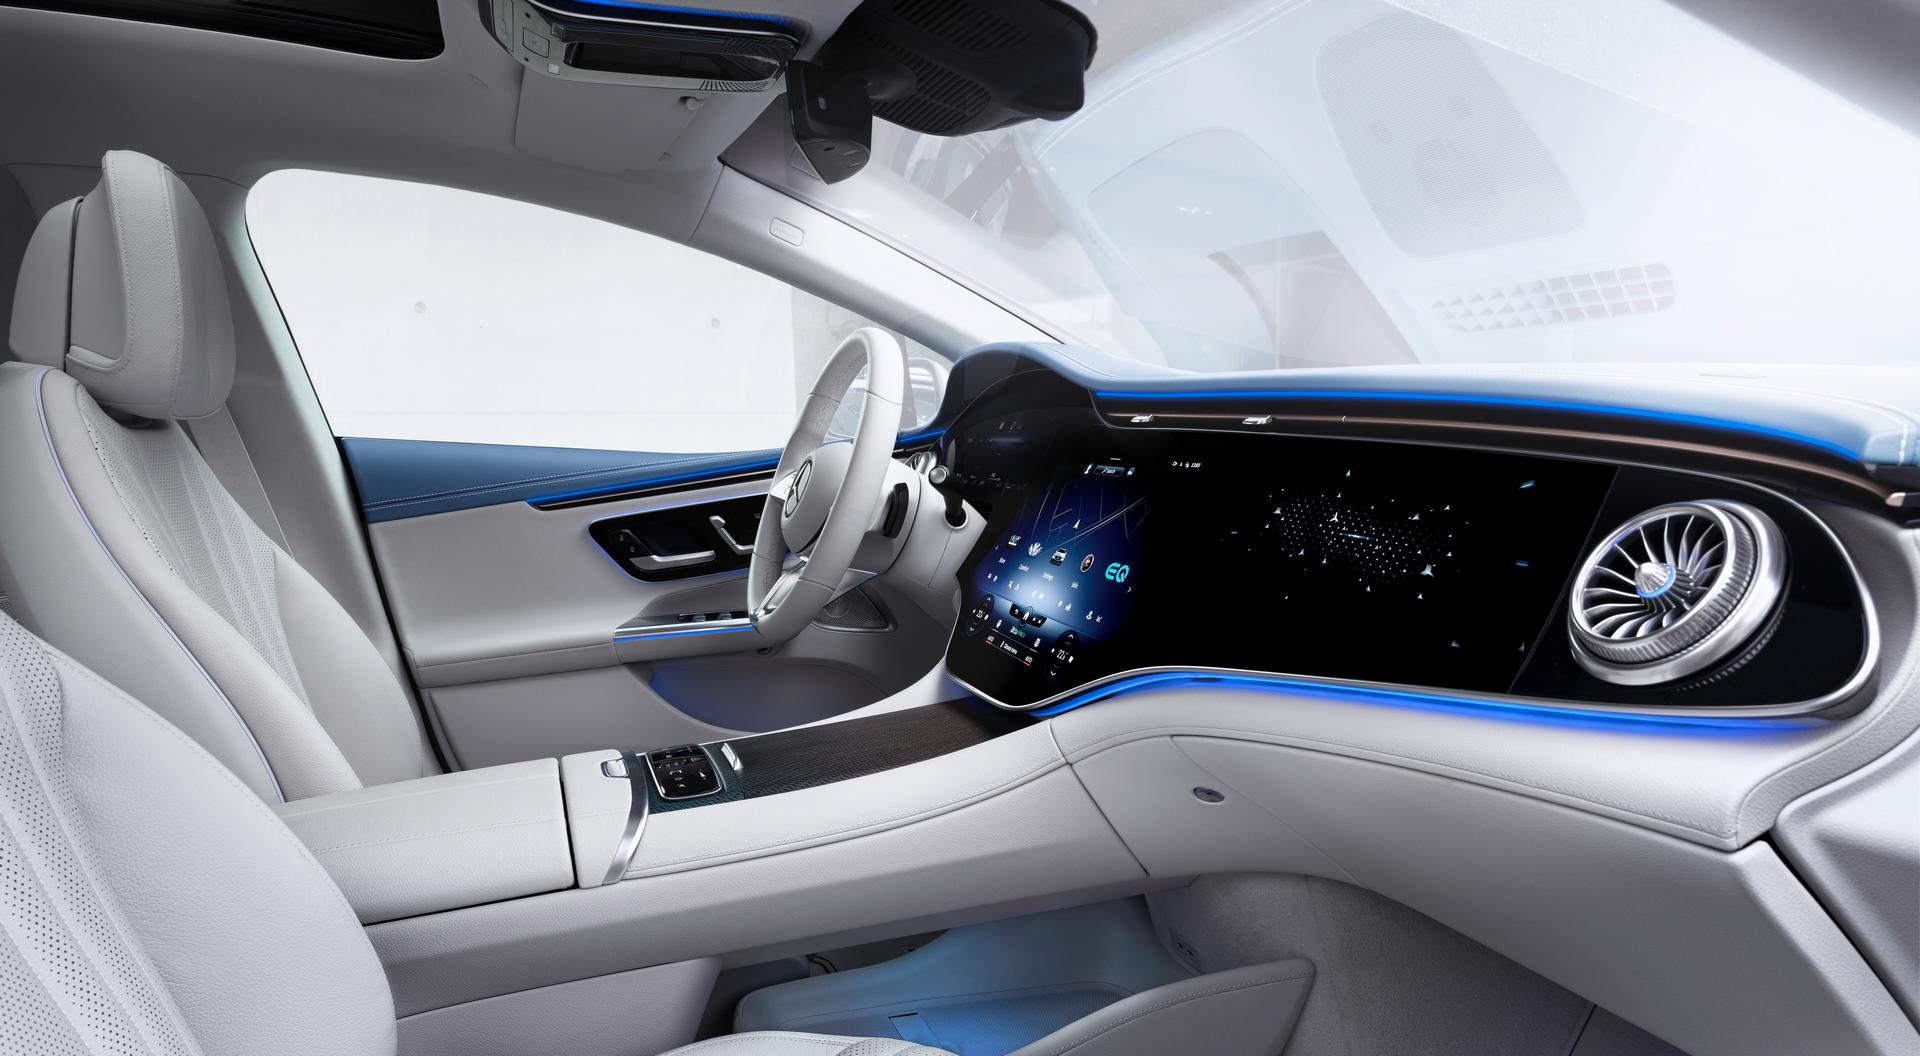 2022 Mercedes-Benz EQE cabin